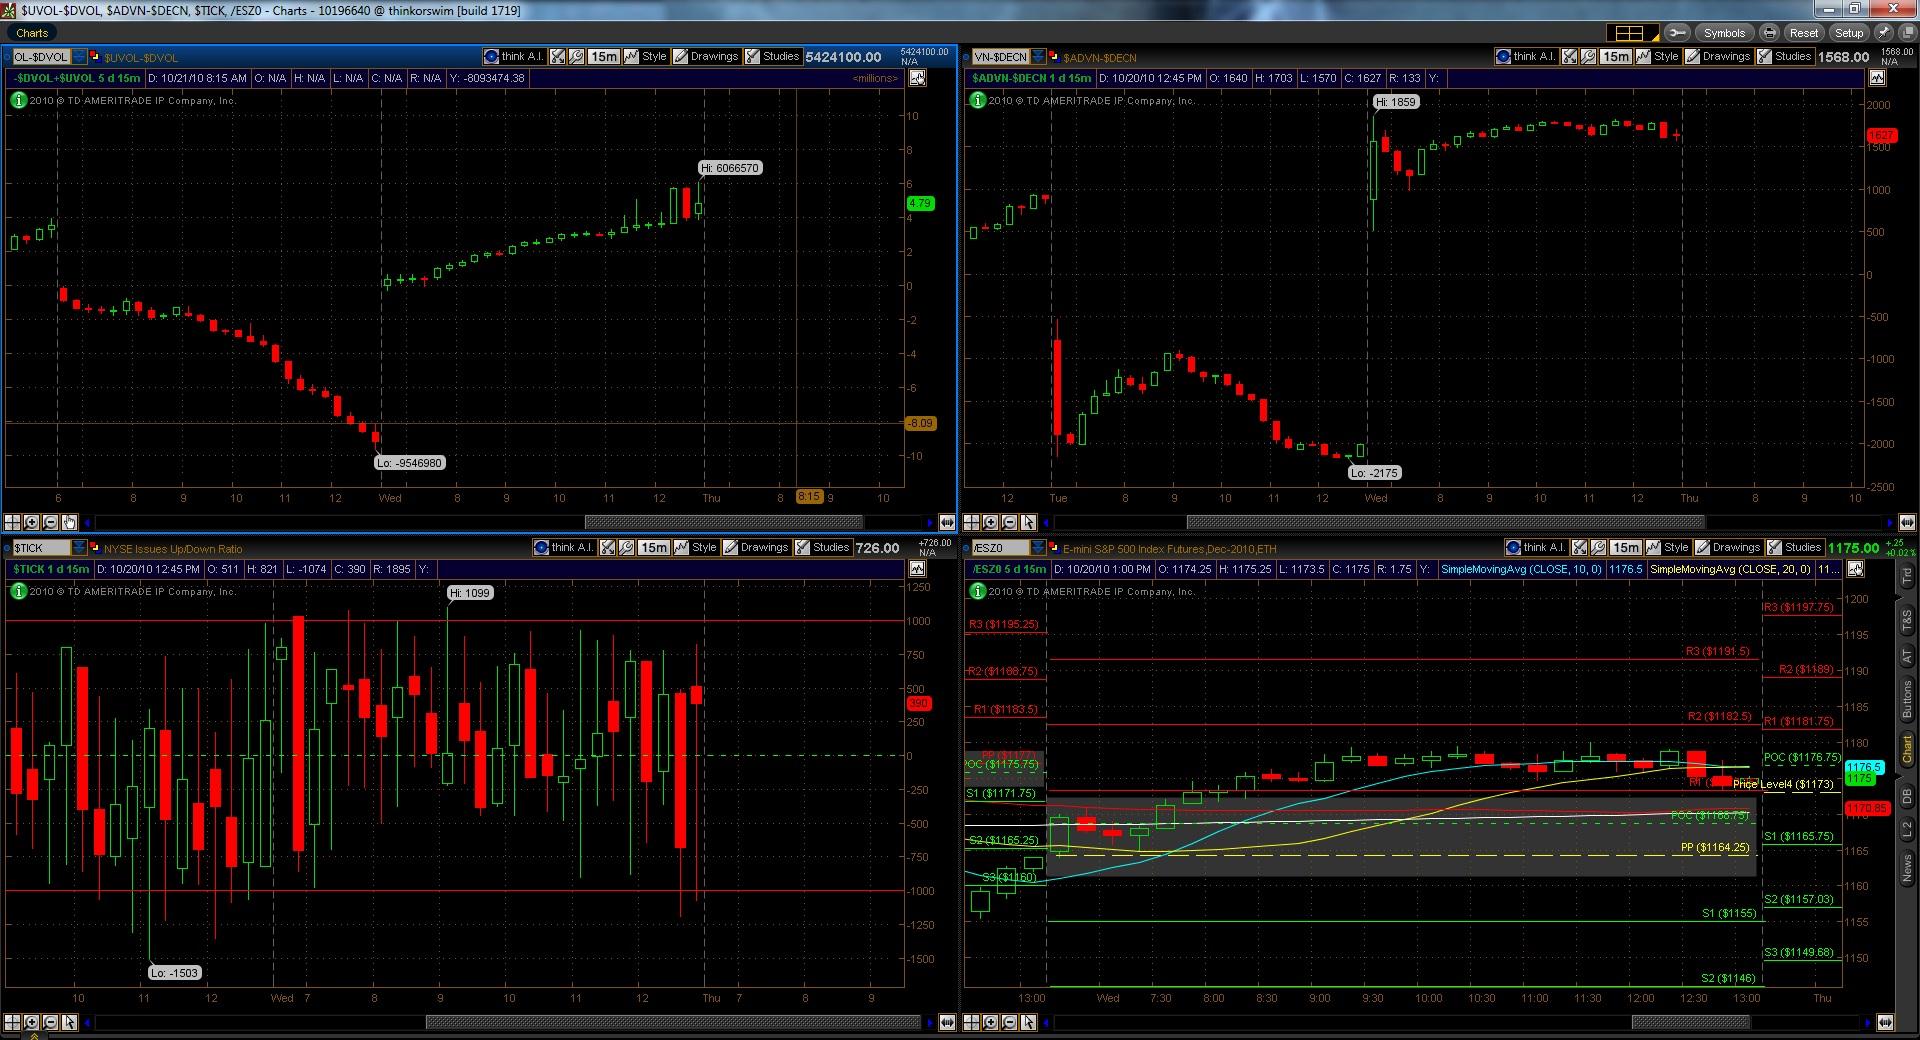 TOS Market Internals